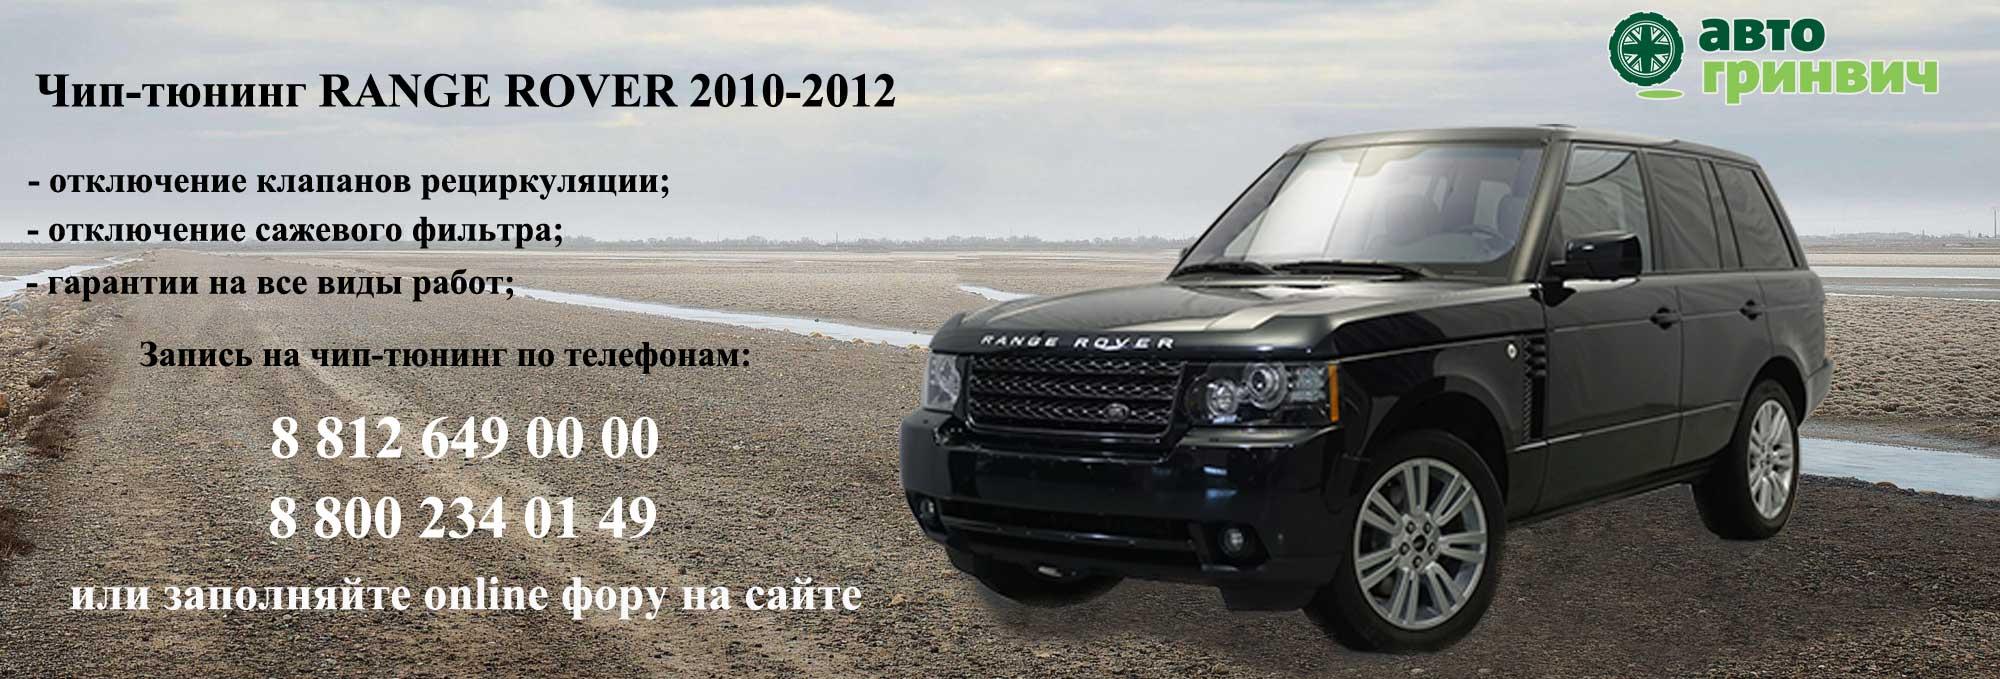 Чип-тюнинг Range Rover 2010-2012